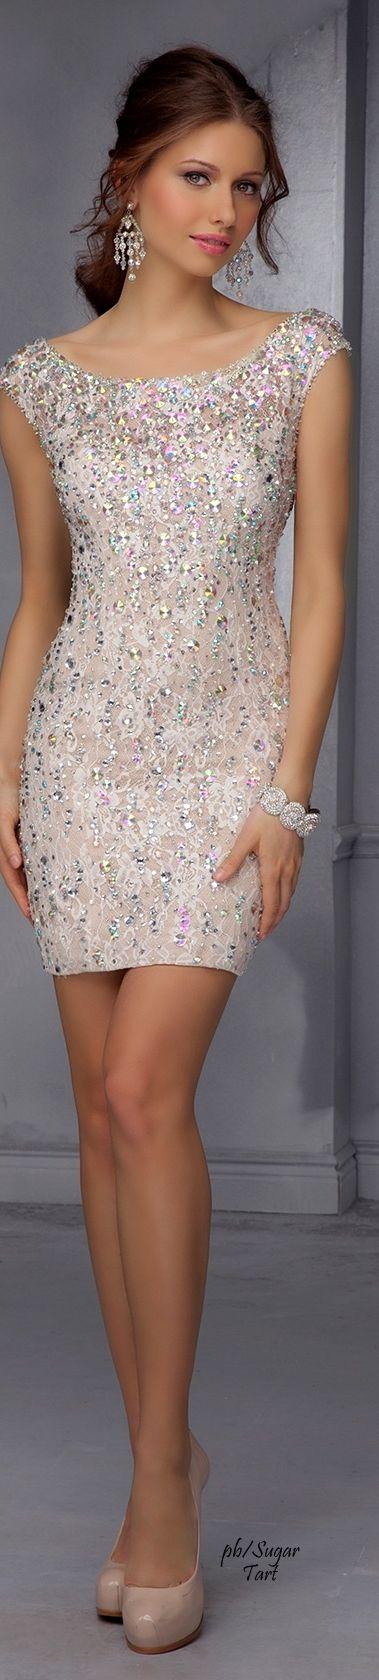 Cocktail Dress | ✿⊱╮Cocktail/Prom Dresses ✿⊱ | Pinterest ...